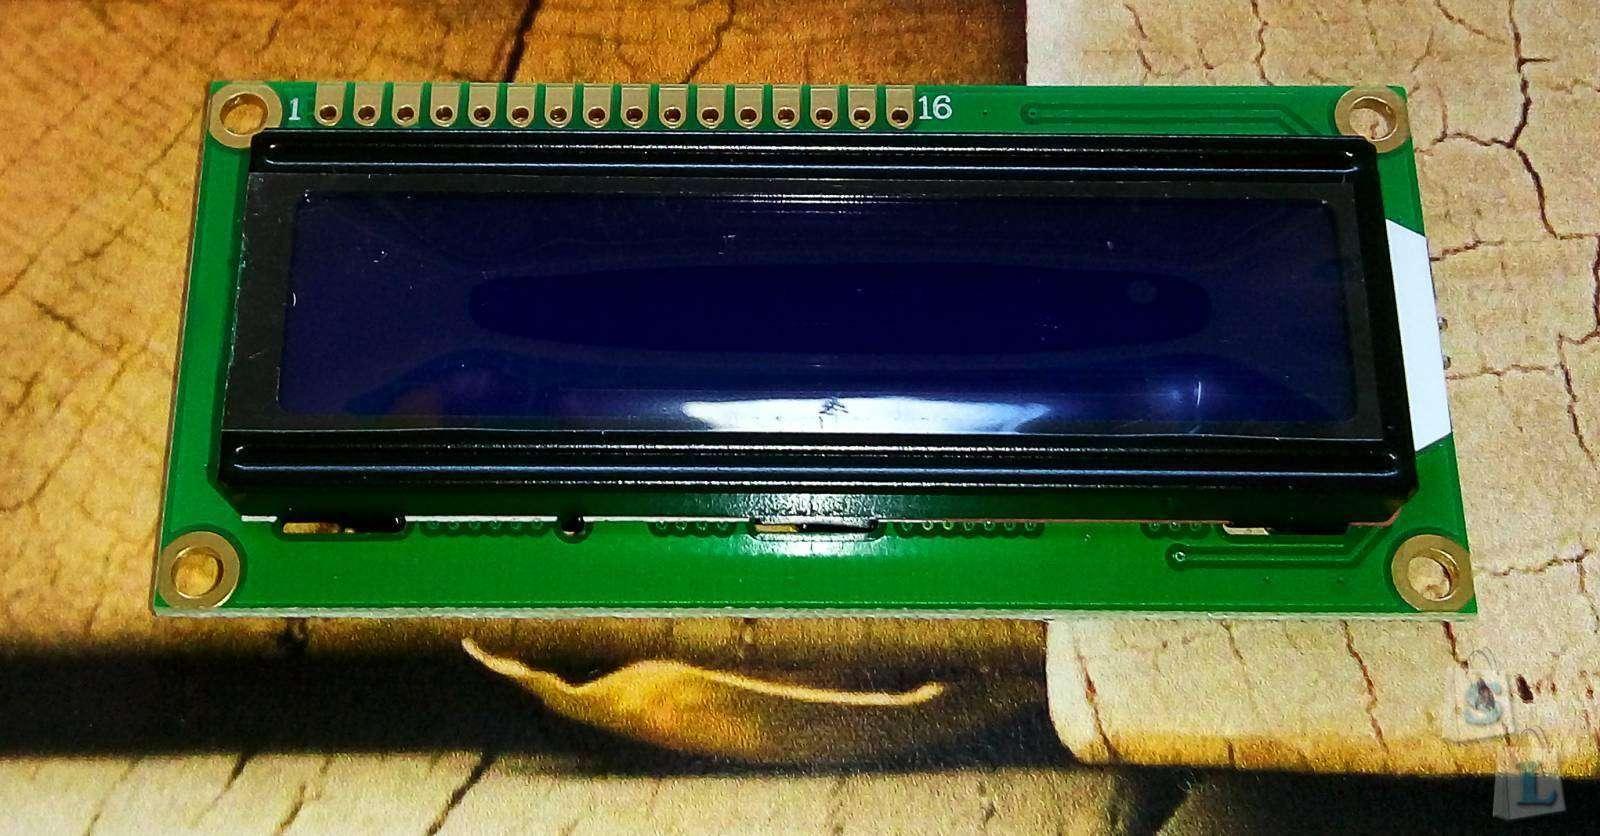 Aliexpress: LCD1602A - замена экрана у Imax B6 mini